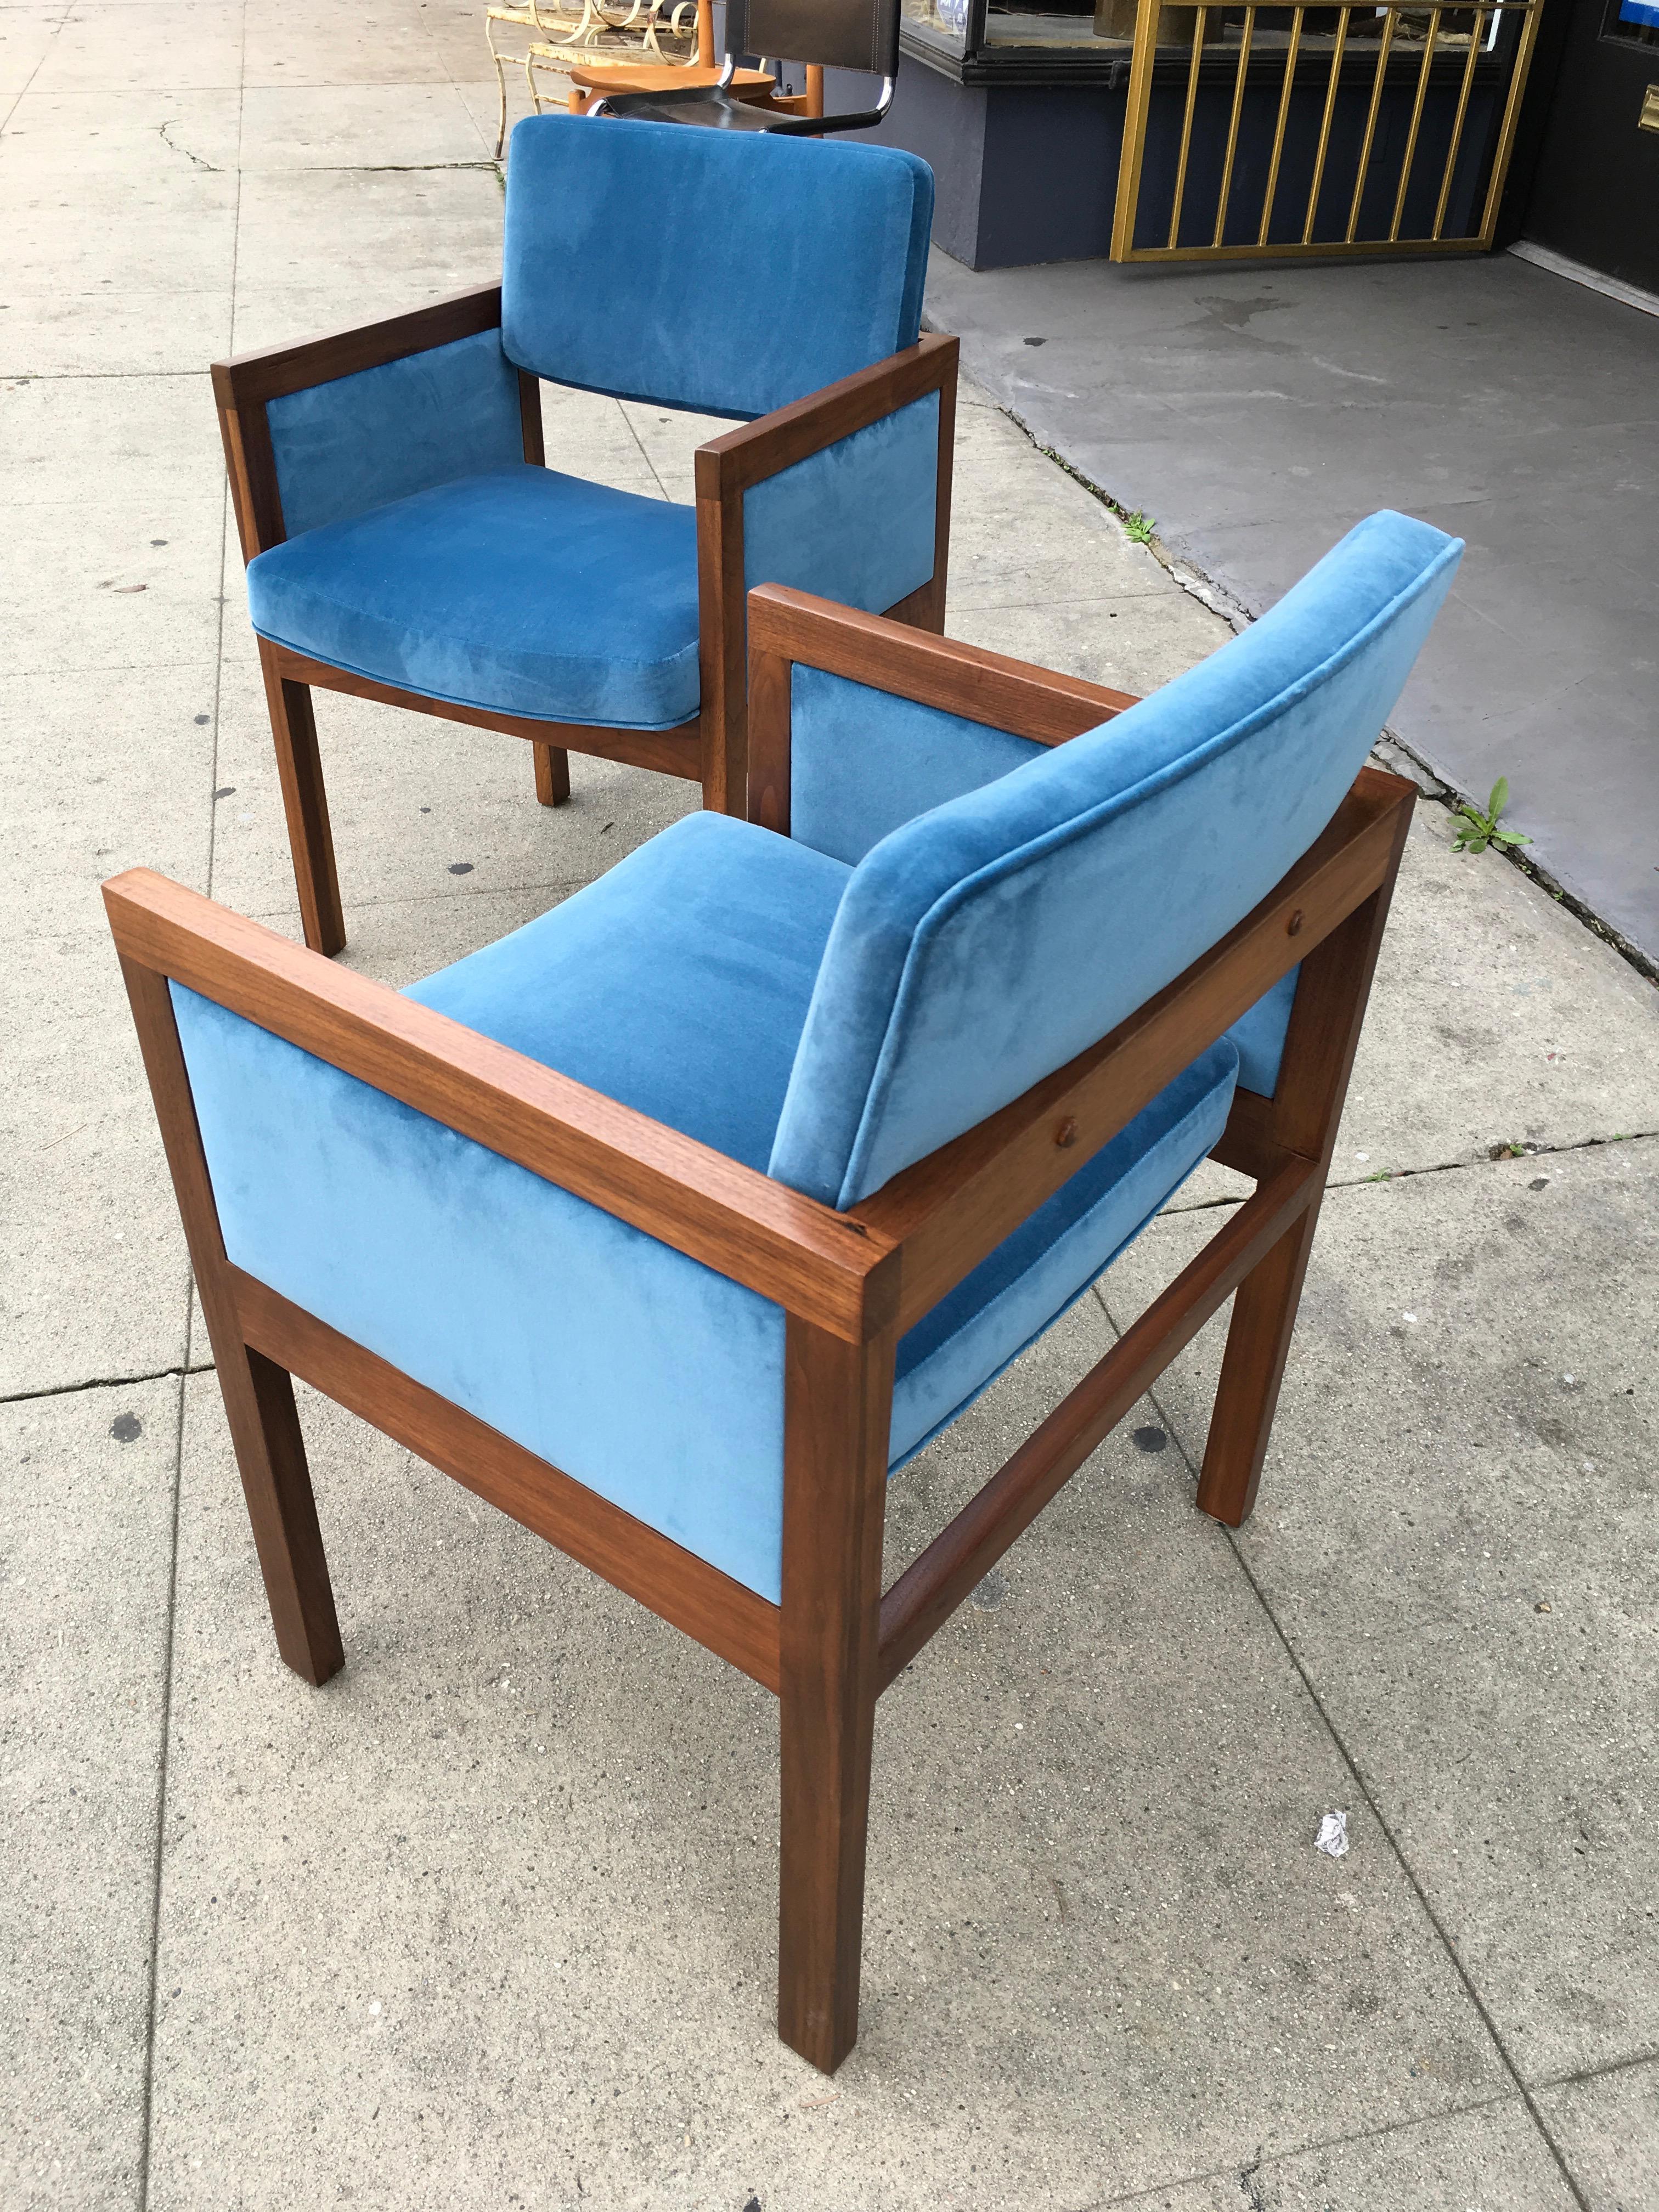 Charmant Robert John Walnut Arm Chairs In Blue Velvet   Image 3 Of 11